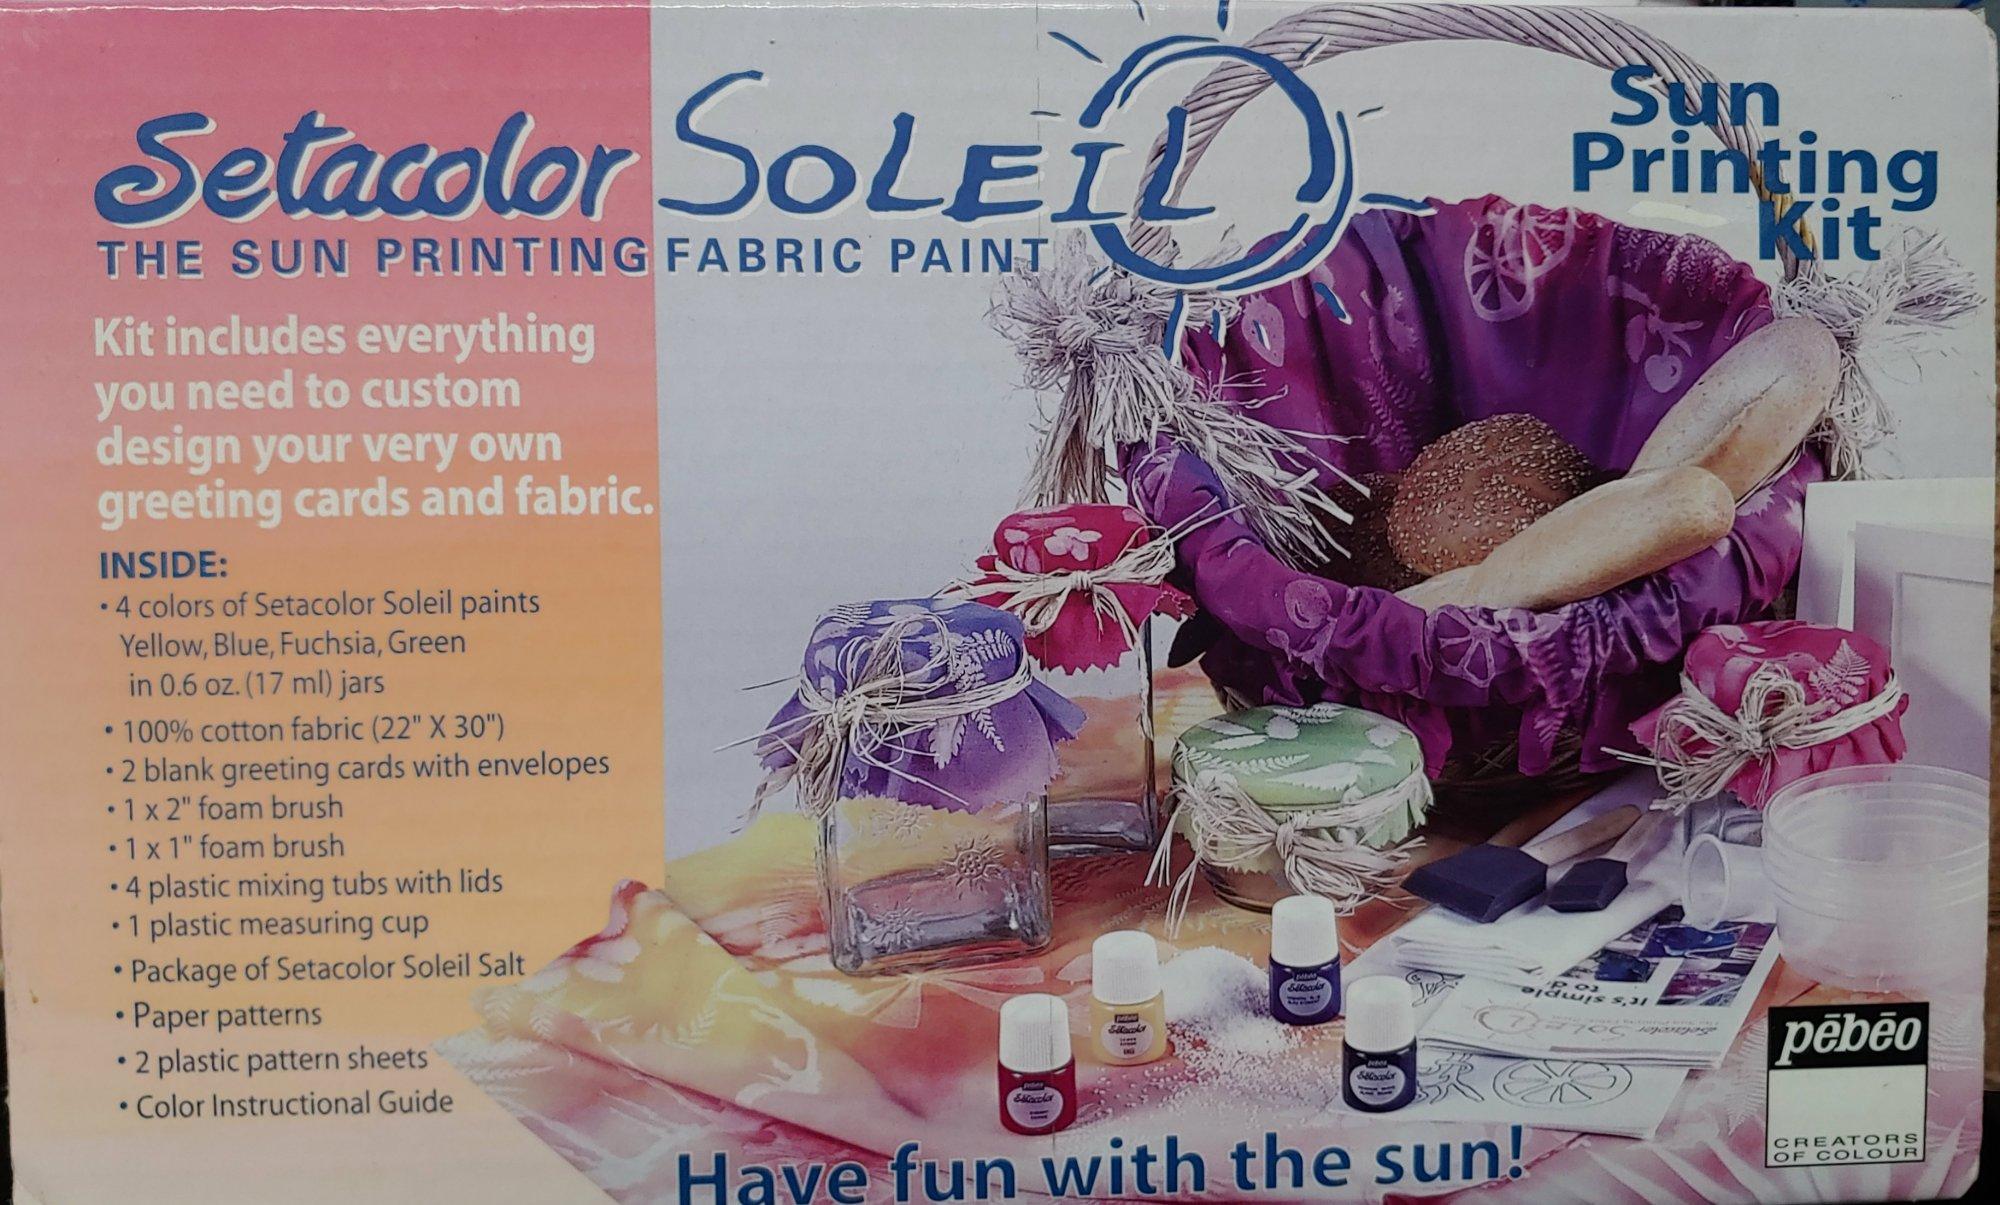 Setacolor Soleil Sun Printing